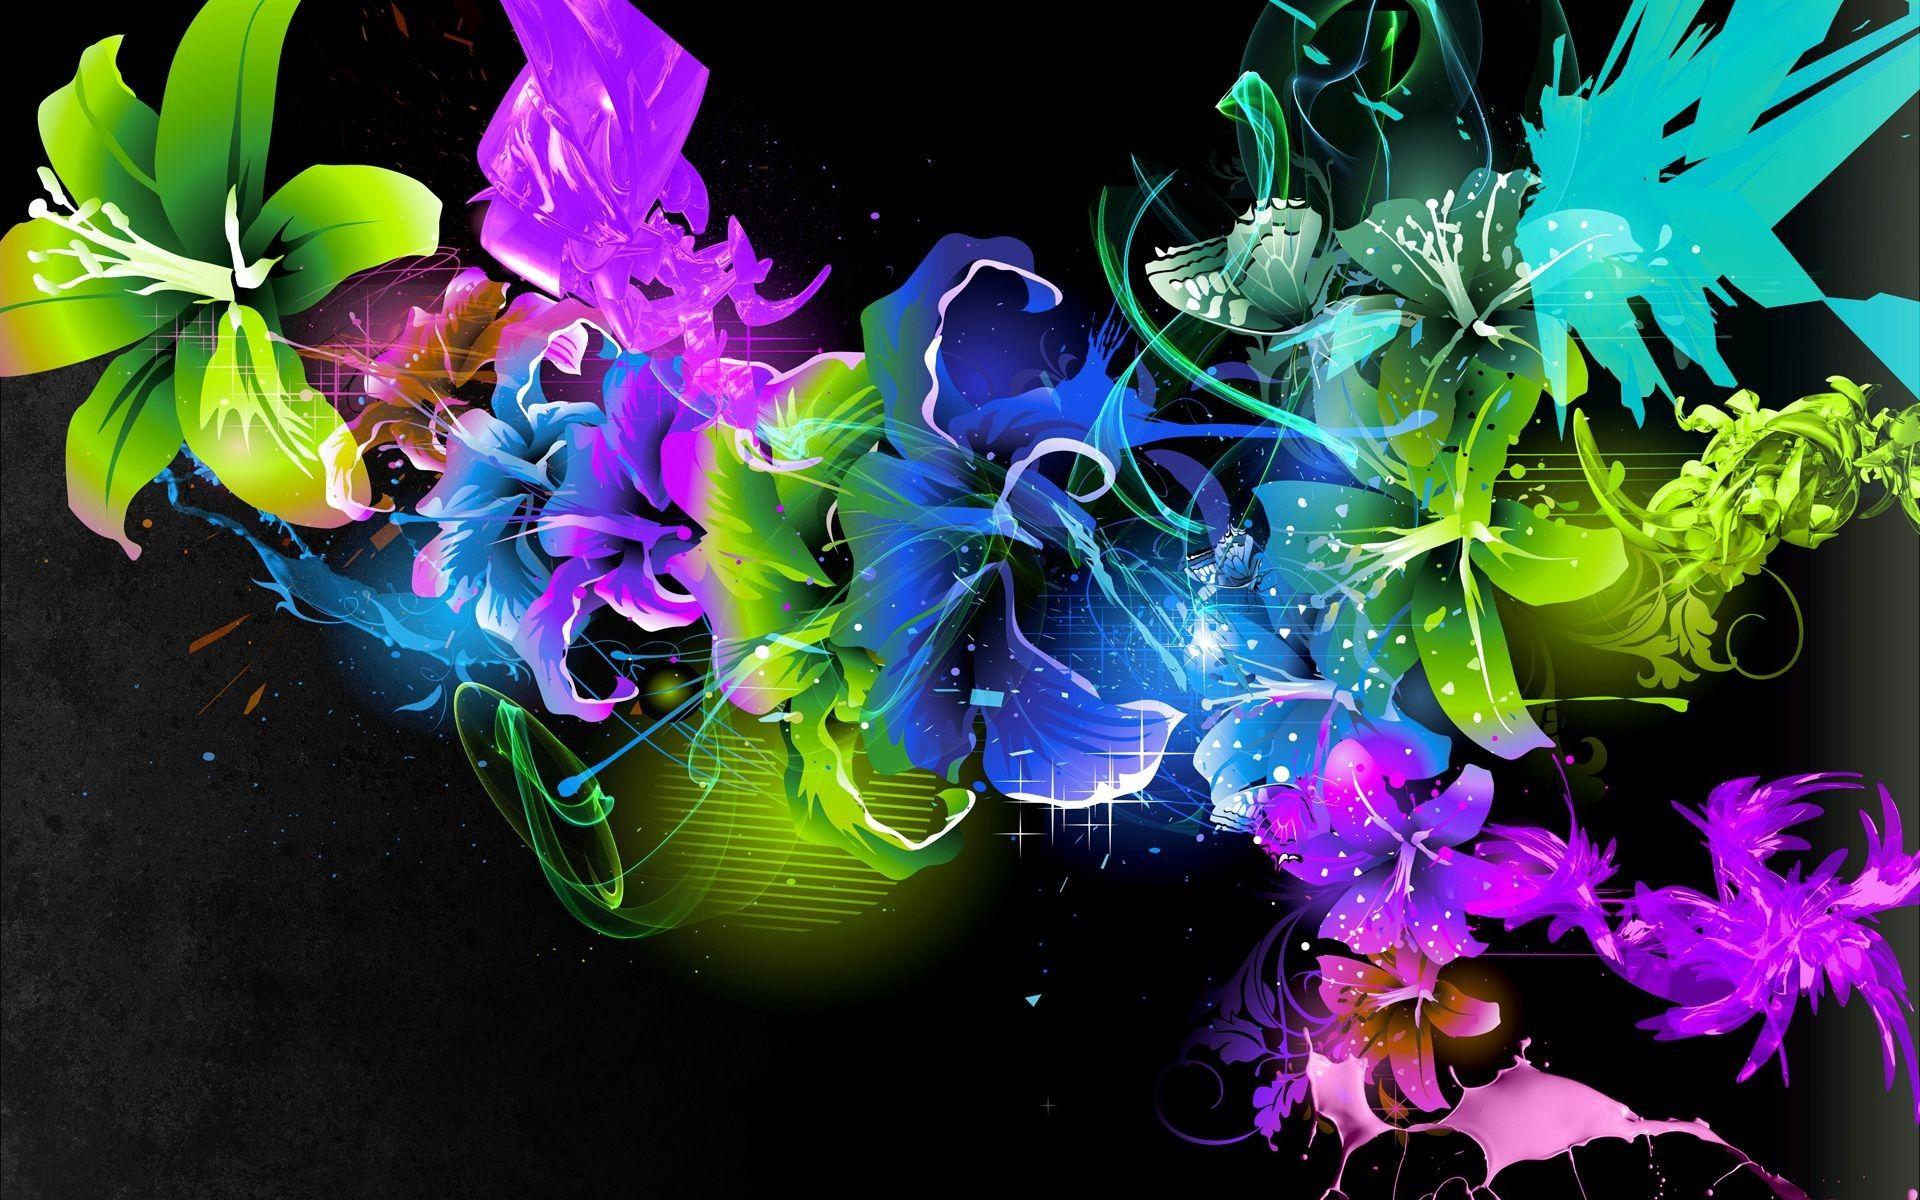 art hd images